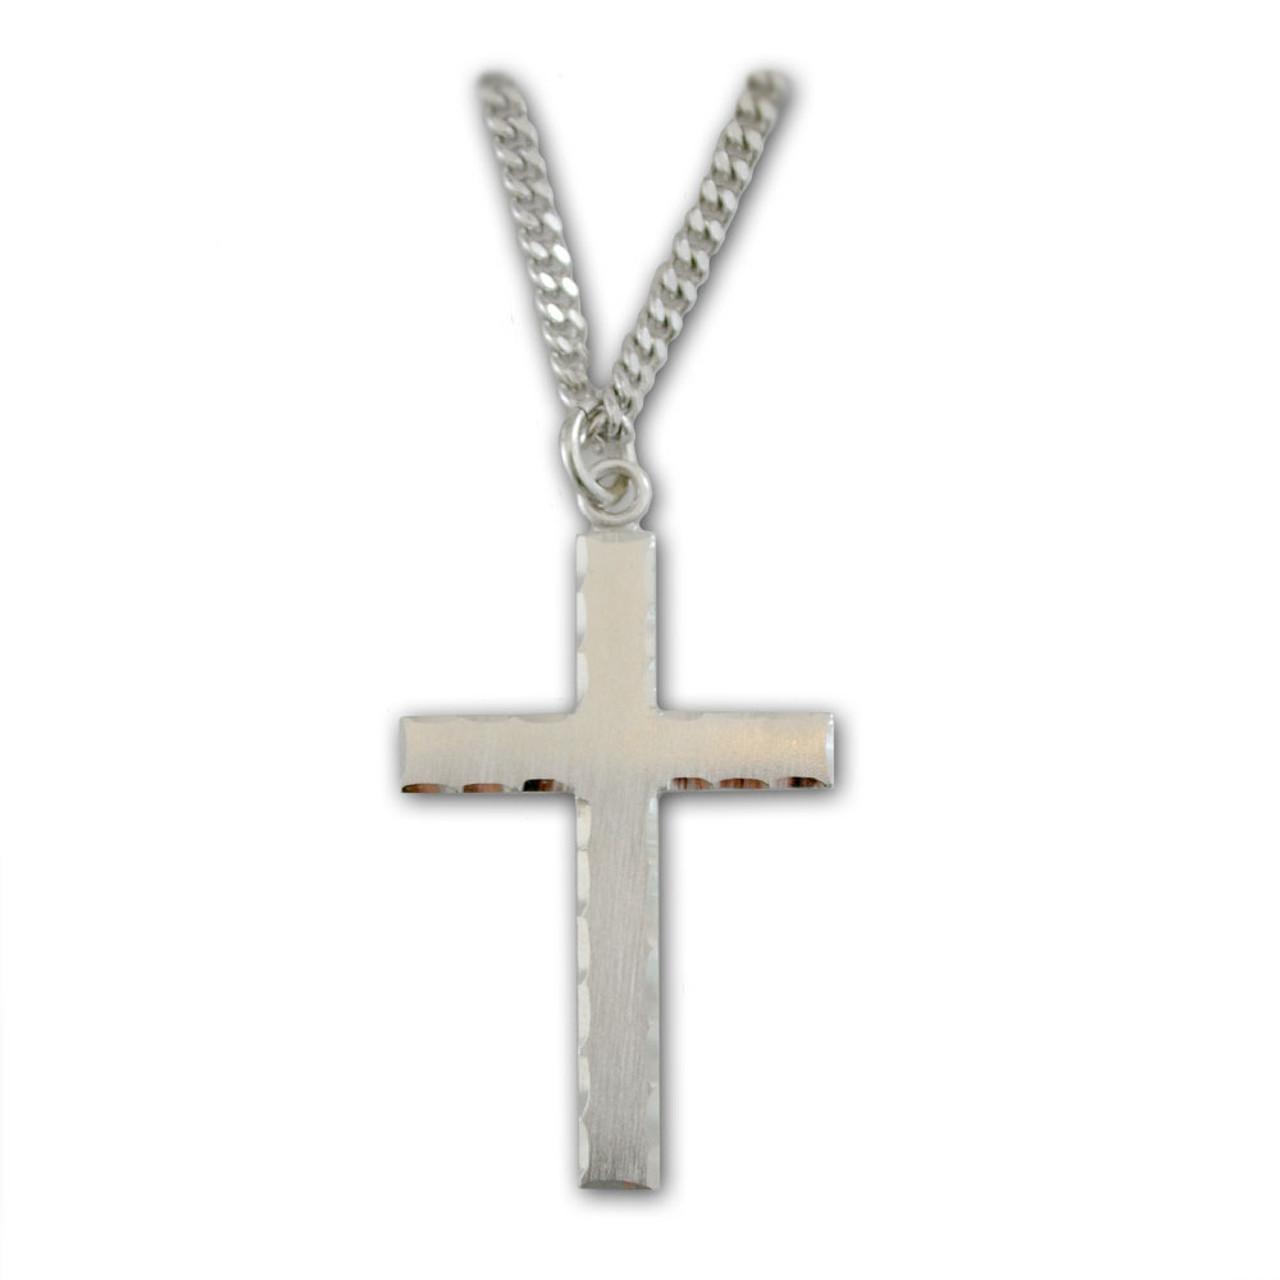 Pearl Locket Prayer Box Locket Sterling Silver Locket Religious Jewelry Mom Gift Confirmation Gift Silver Cross Locket Cross Necklace